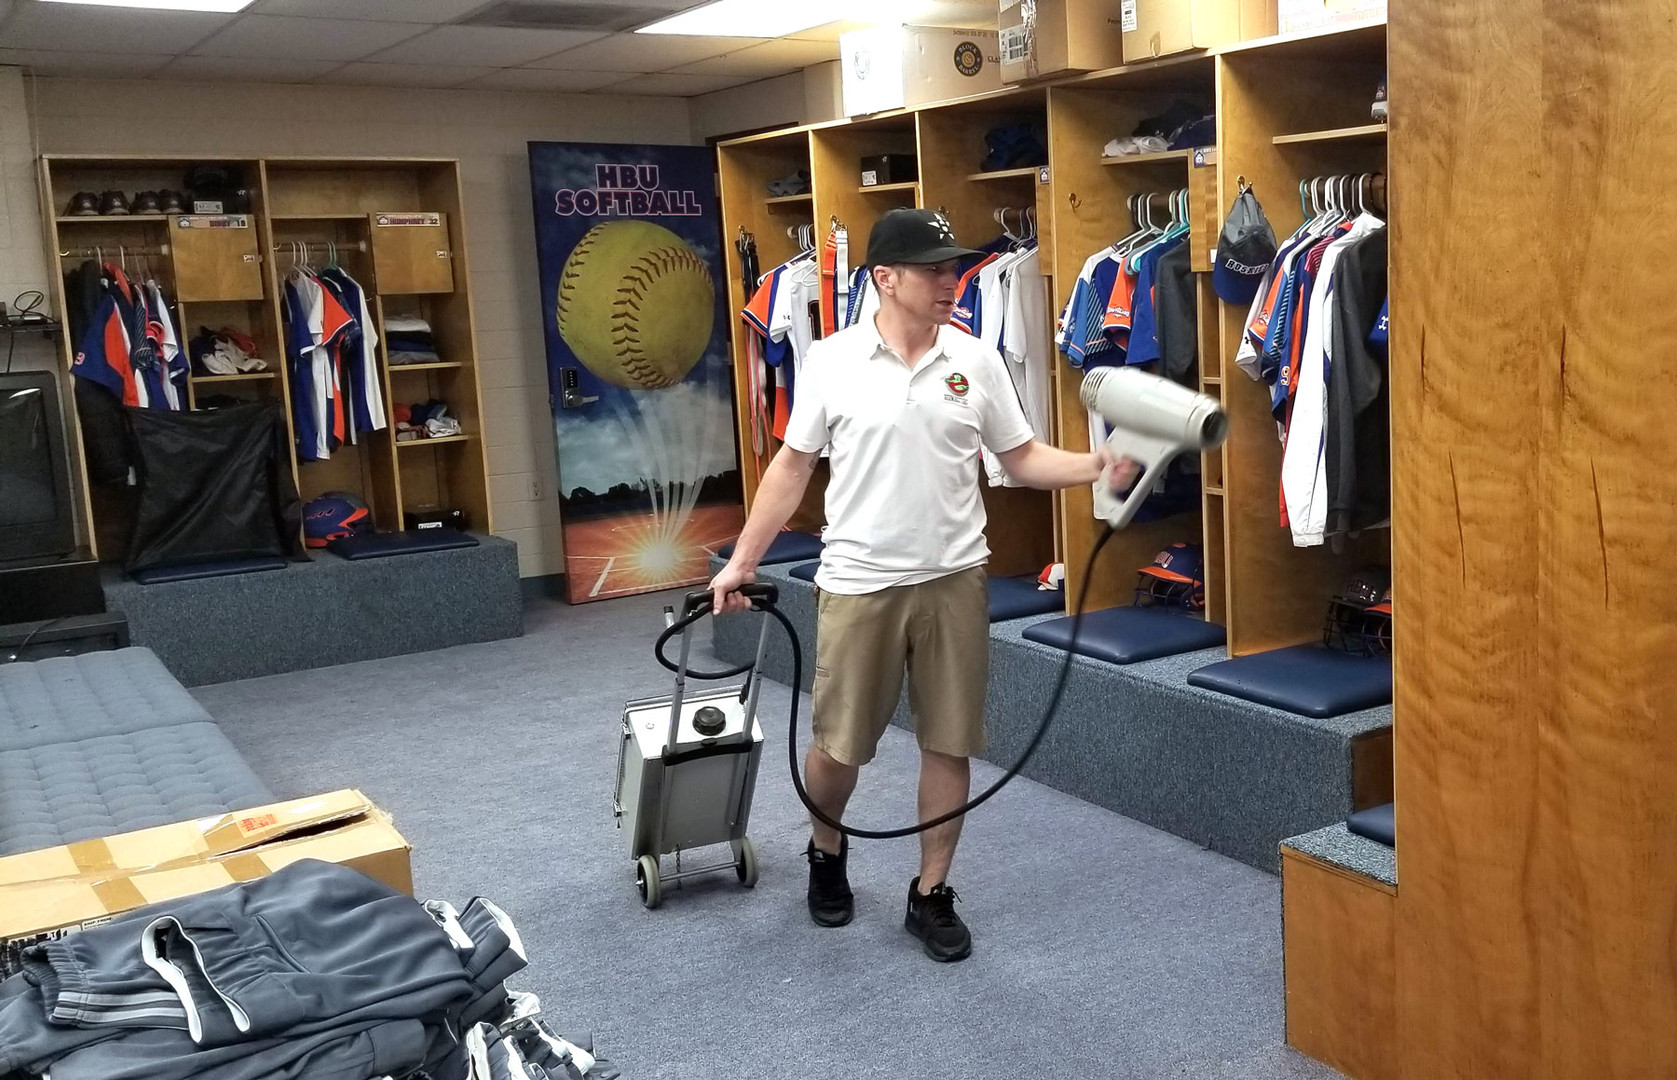 HBU-Softball-Locker-room-sanitation-spra